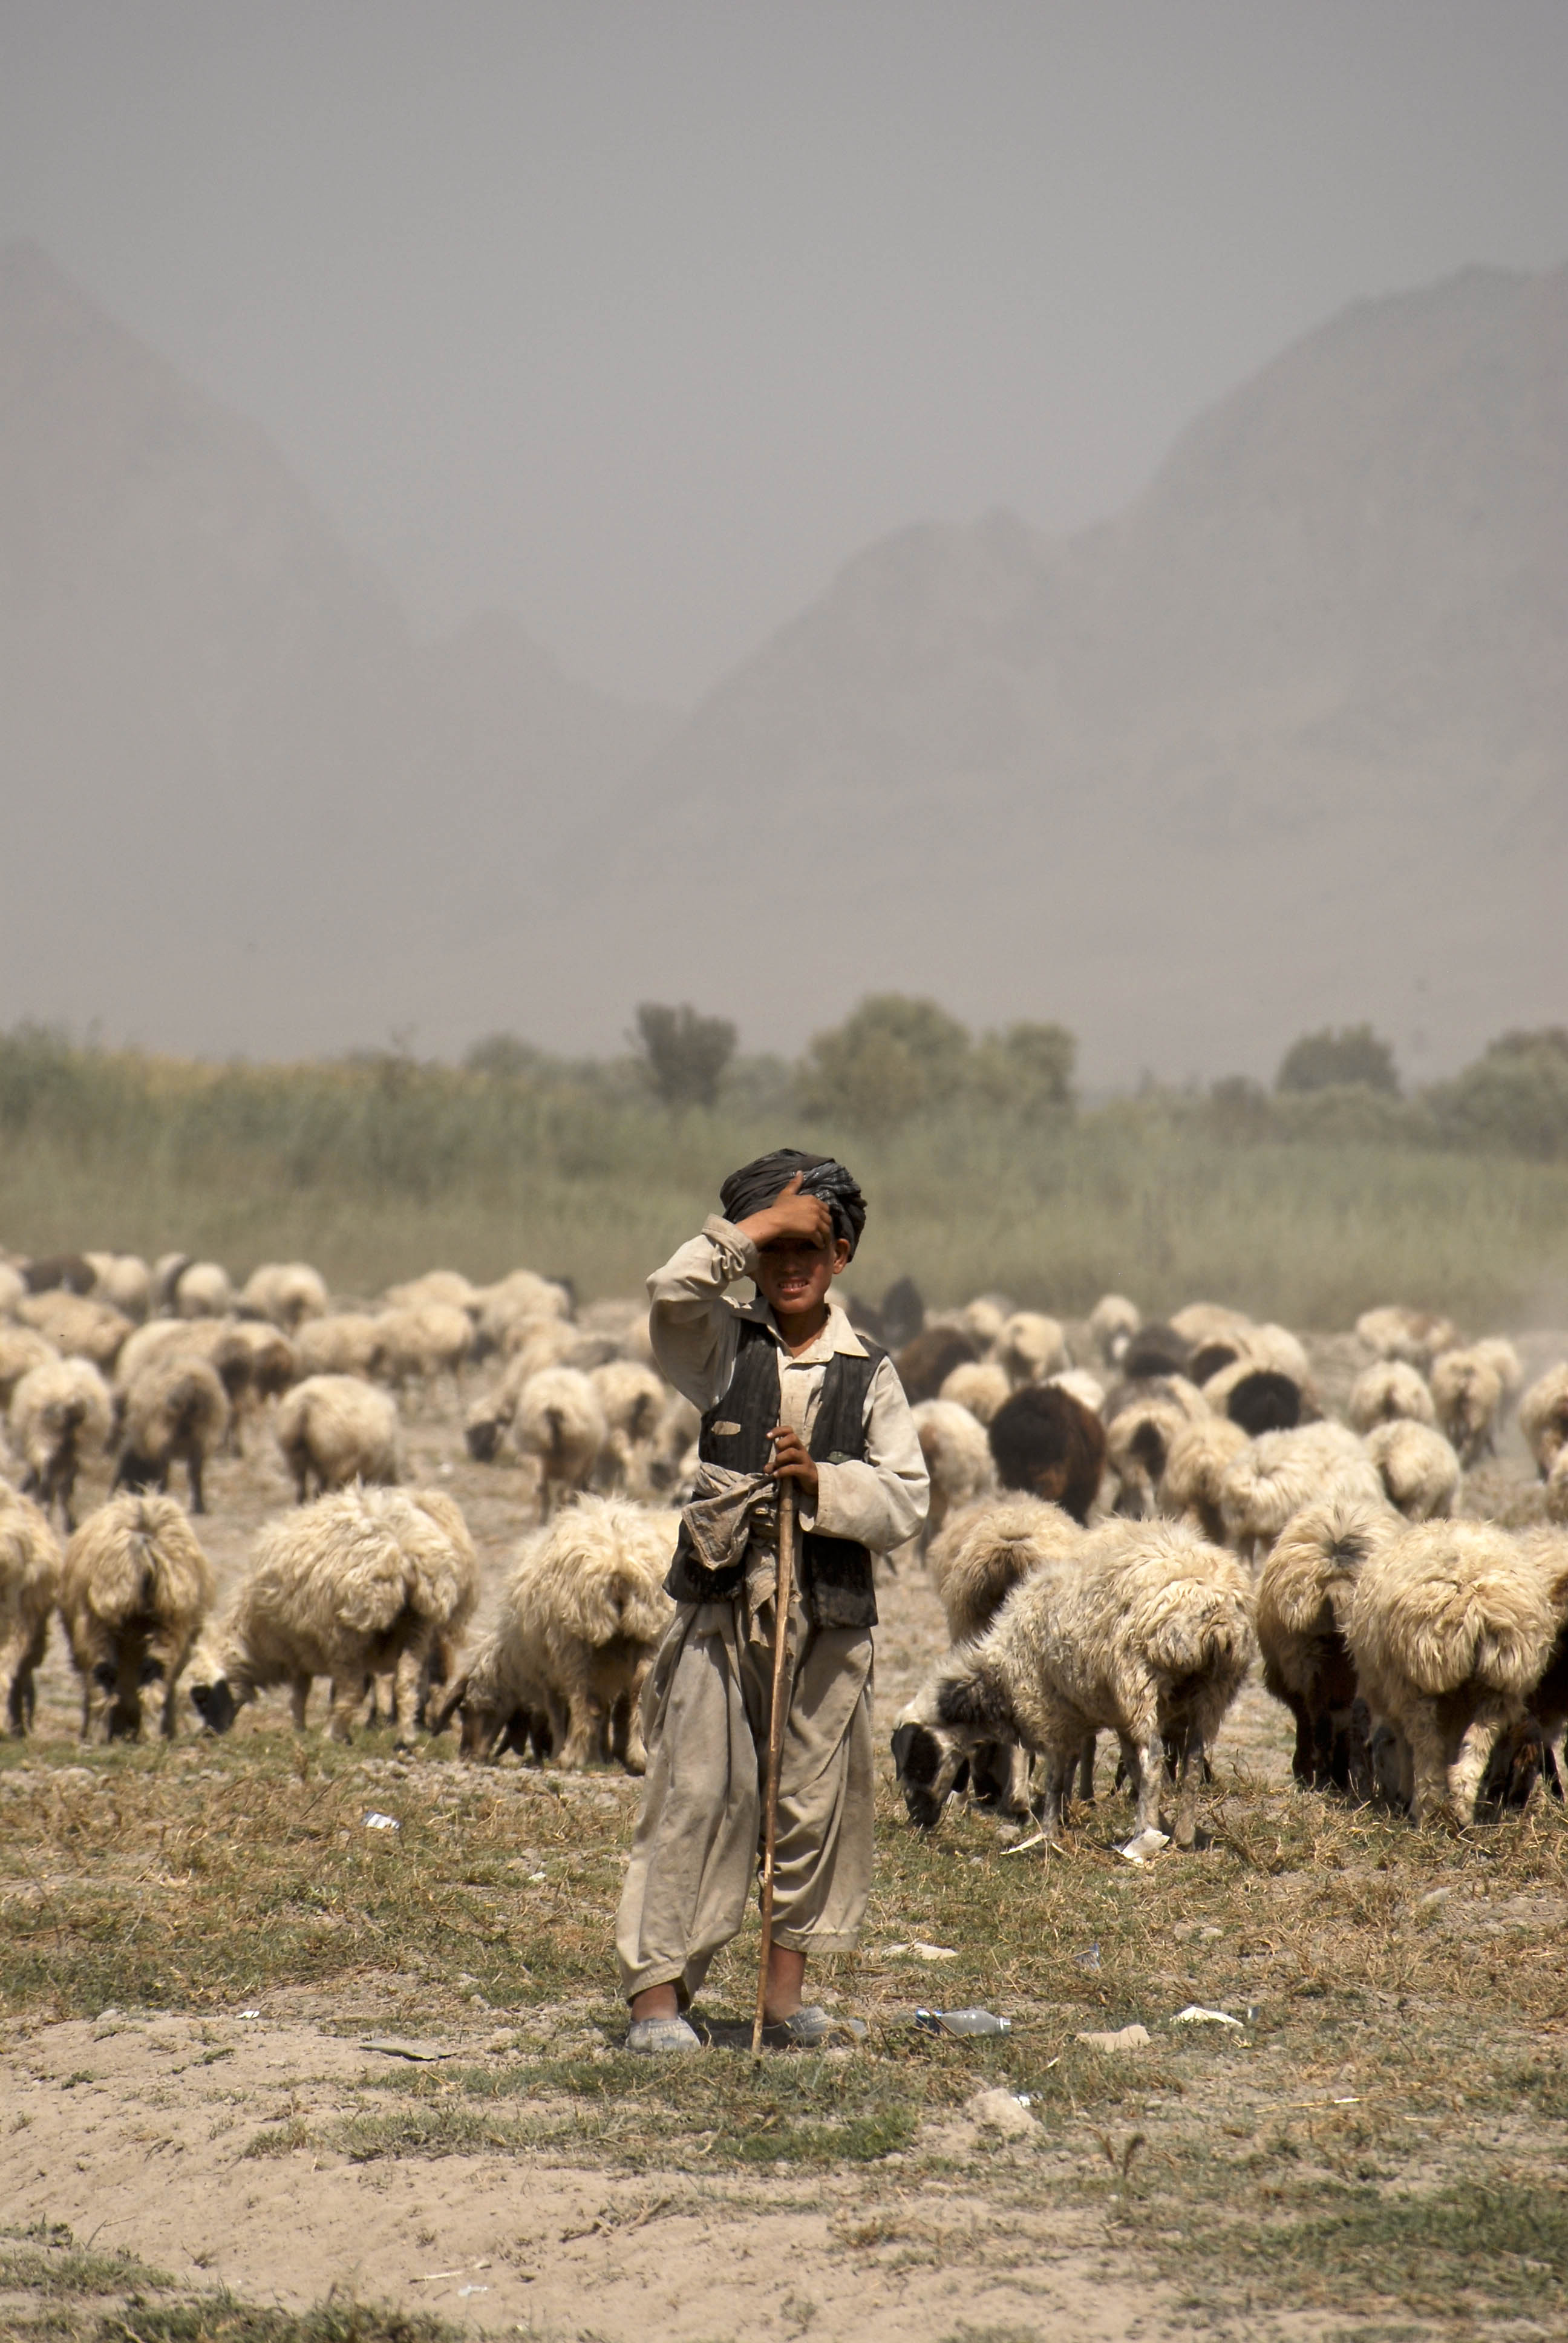 Afghan Shepherd: File:Young Afghan Shepherd In Kandahar Province.jpg